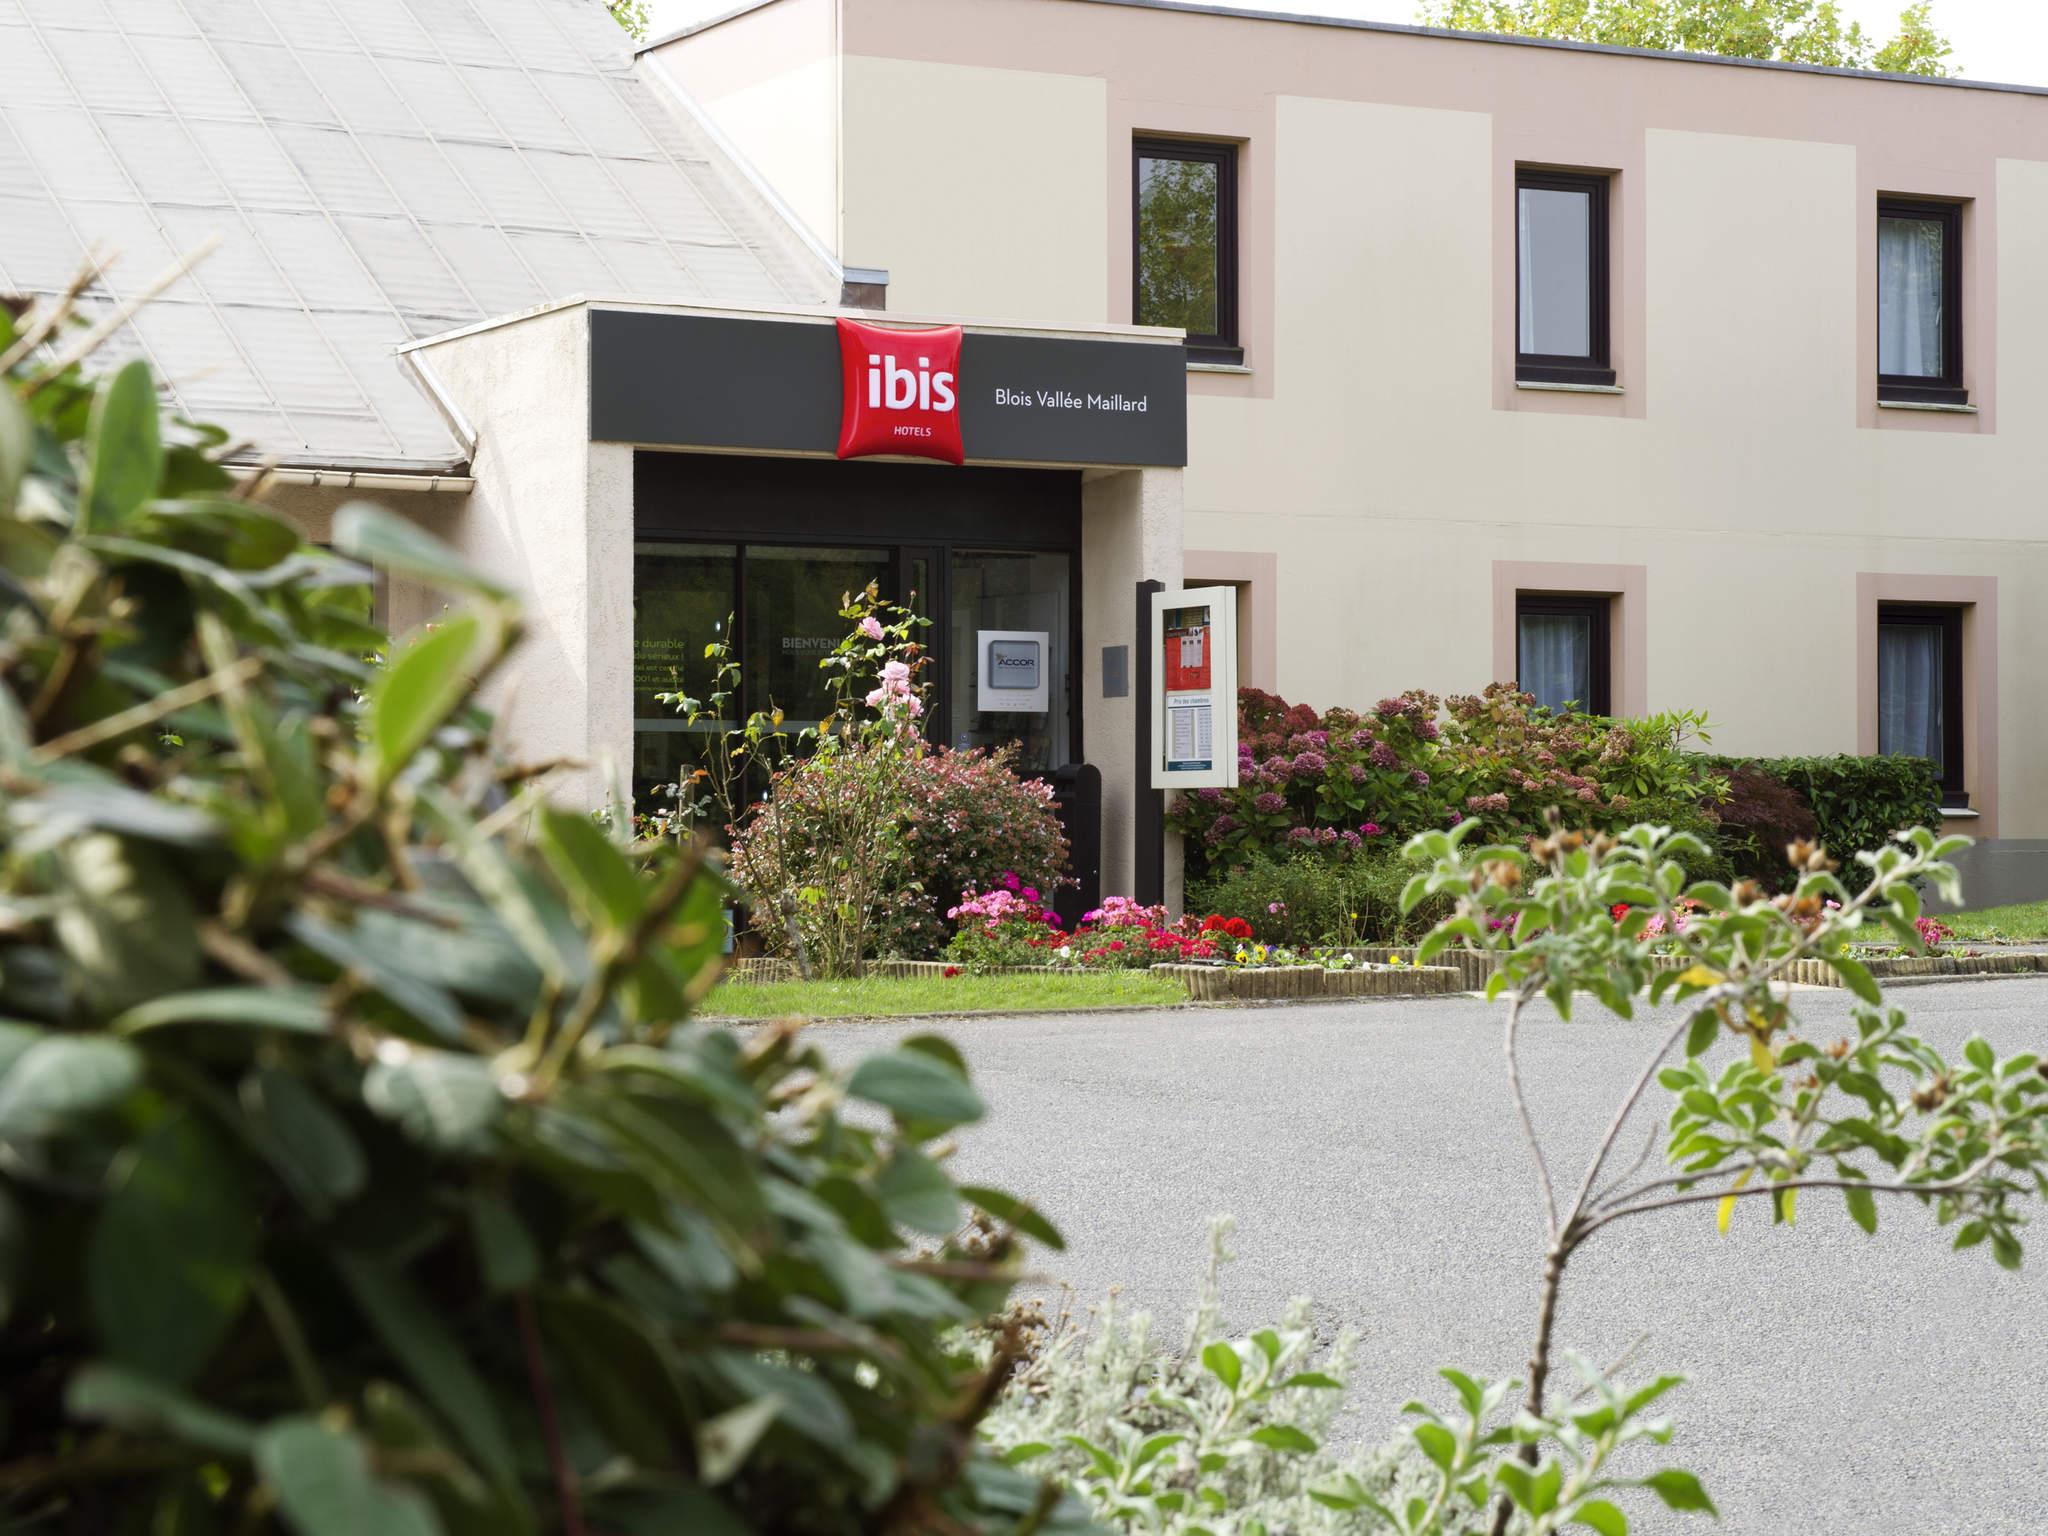 Hotell – ibis Blois Vallée Maillard